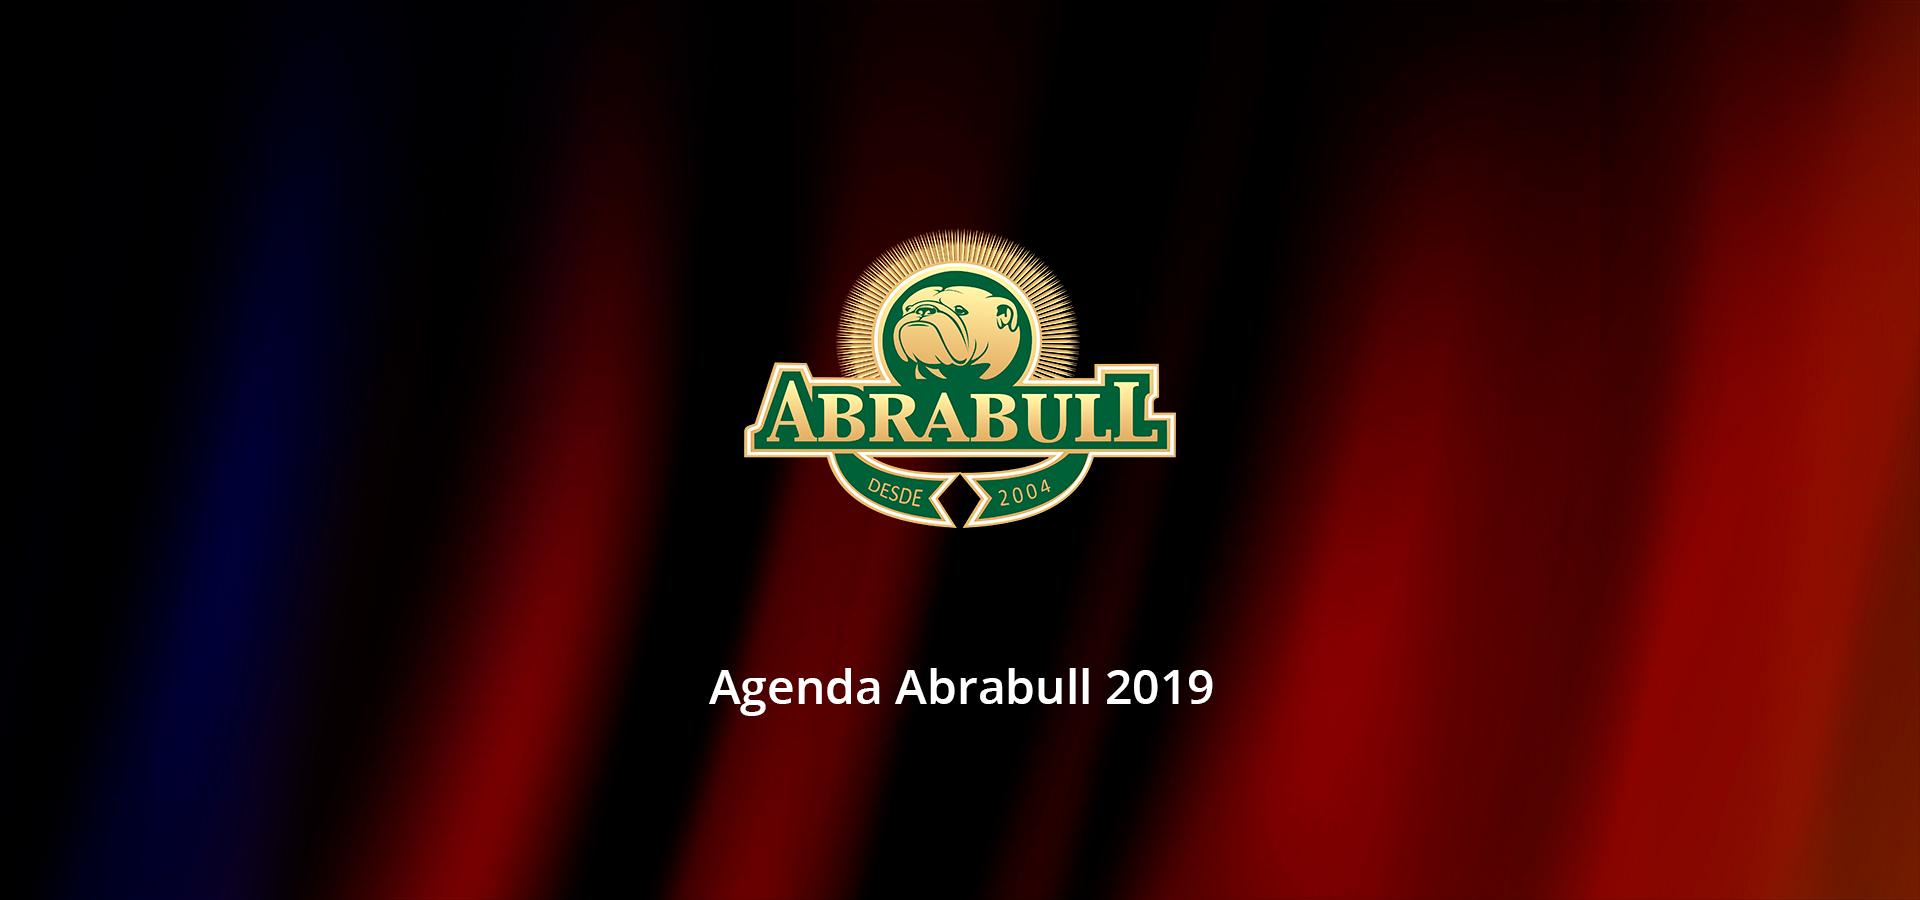 Agenda Abrabull